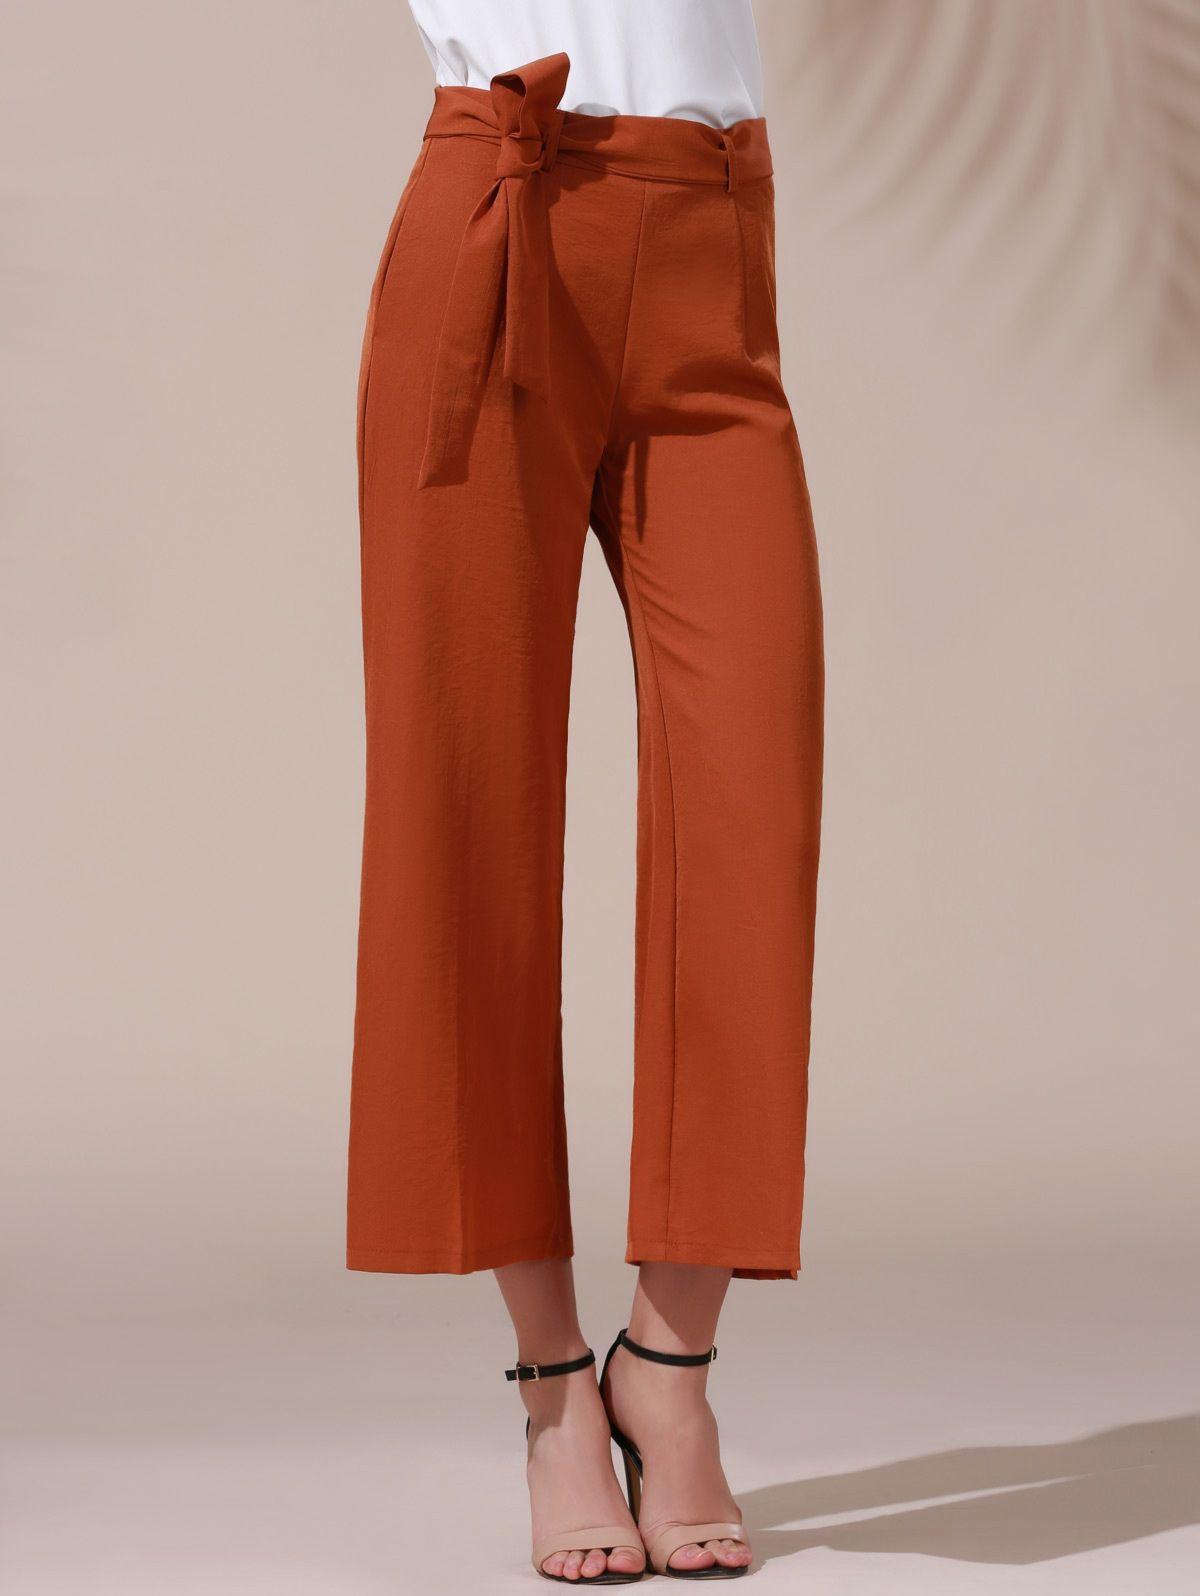 d5b7869c507a Solid Color Belted High Waist Wide Leg Pant DARK KHAKI  Pants